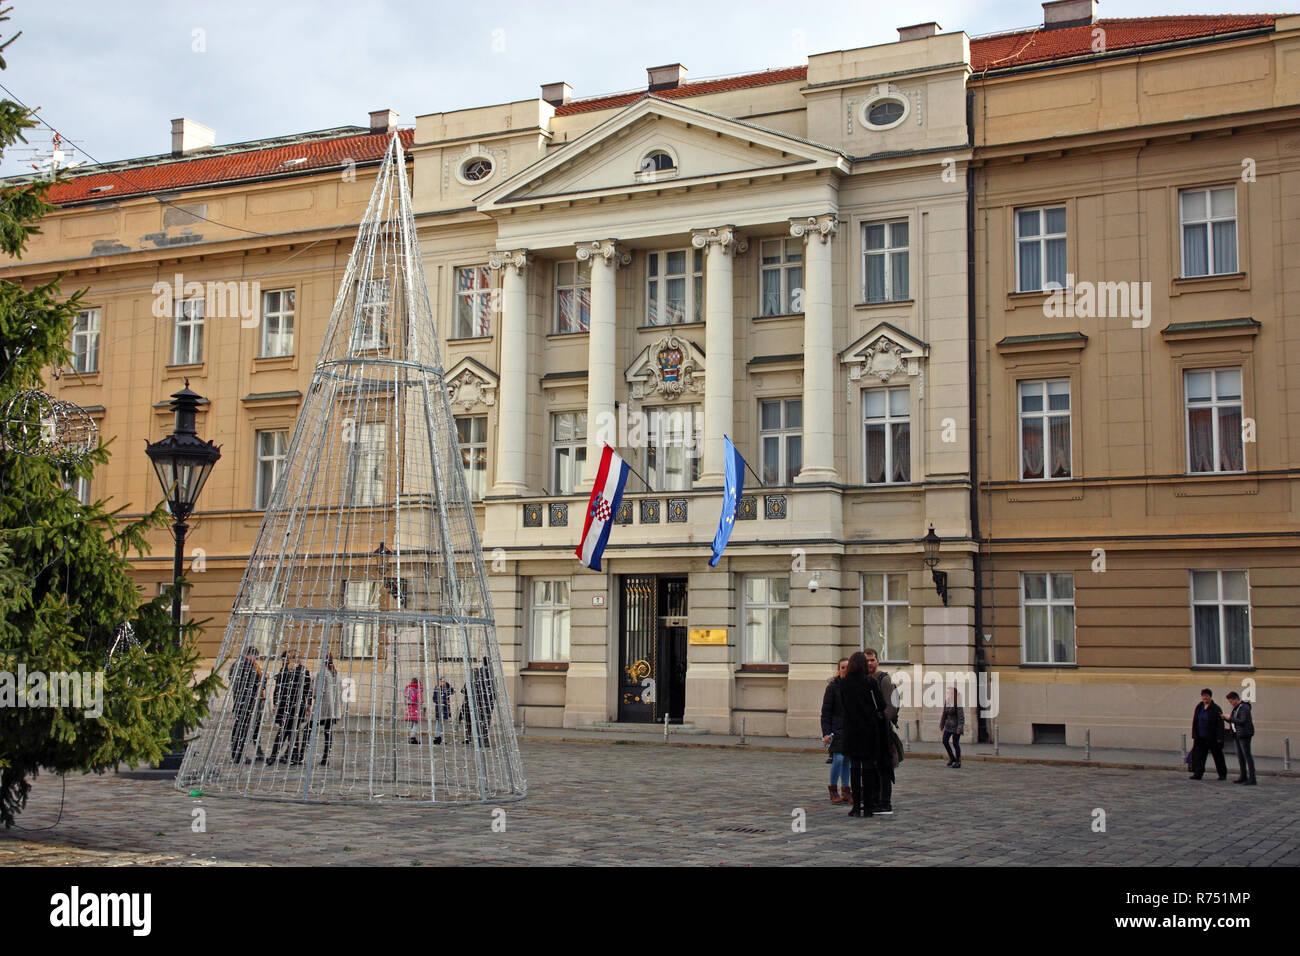 ZAGREB, CROATIA - JANUARY 6, 2018: Croatian Parliament with Flags of European Union and Croatia - Stock Image